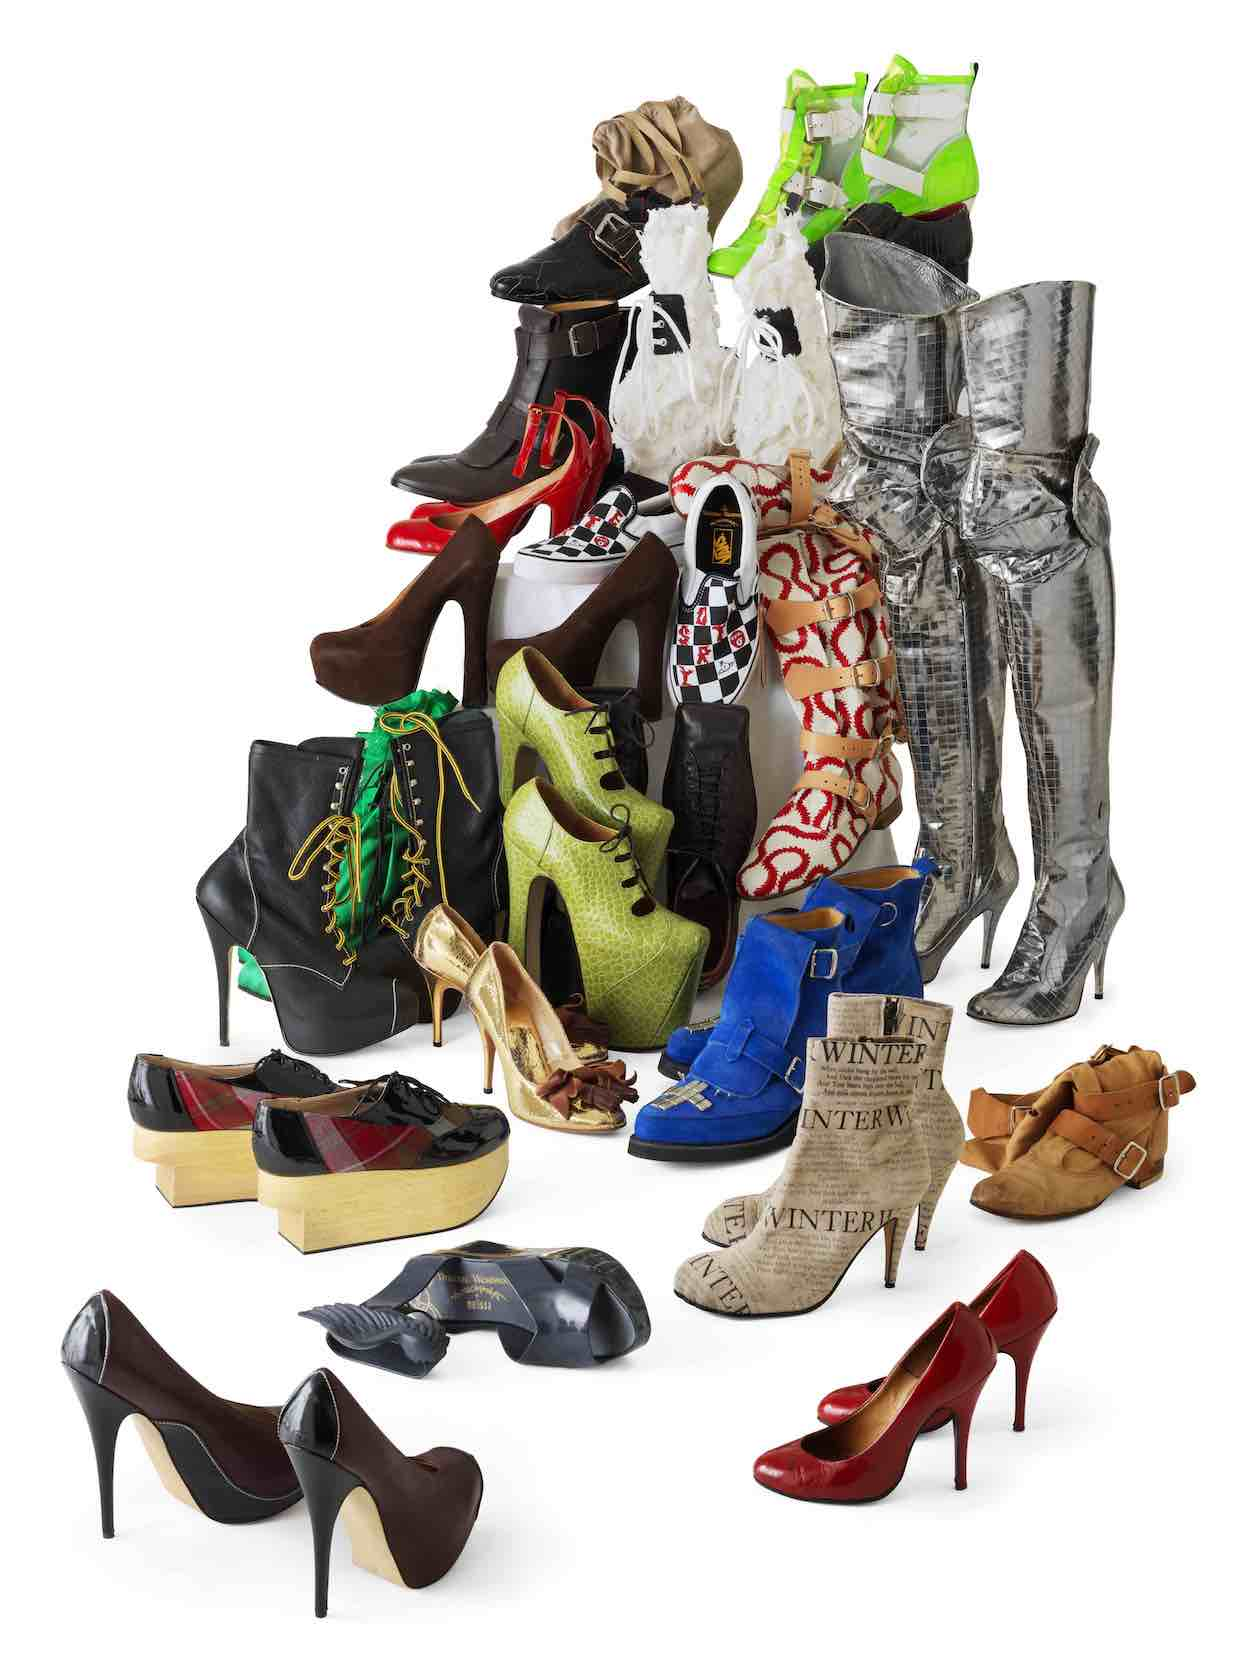 V.Westwood, Footwear, collection of Lee Price©Pierre Verrier, Musée des Tissus, Lyon